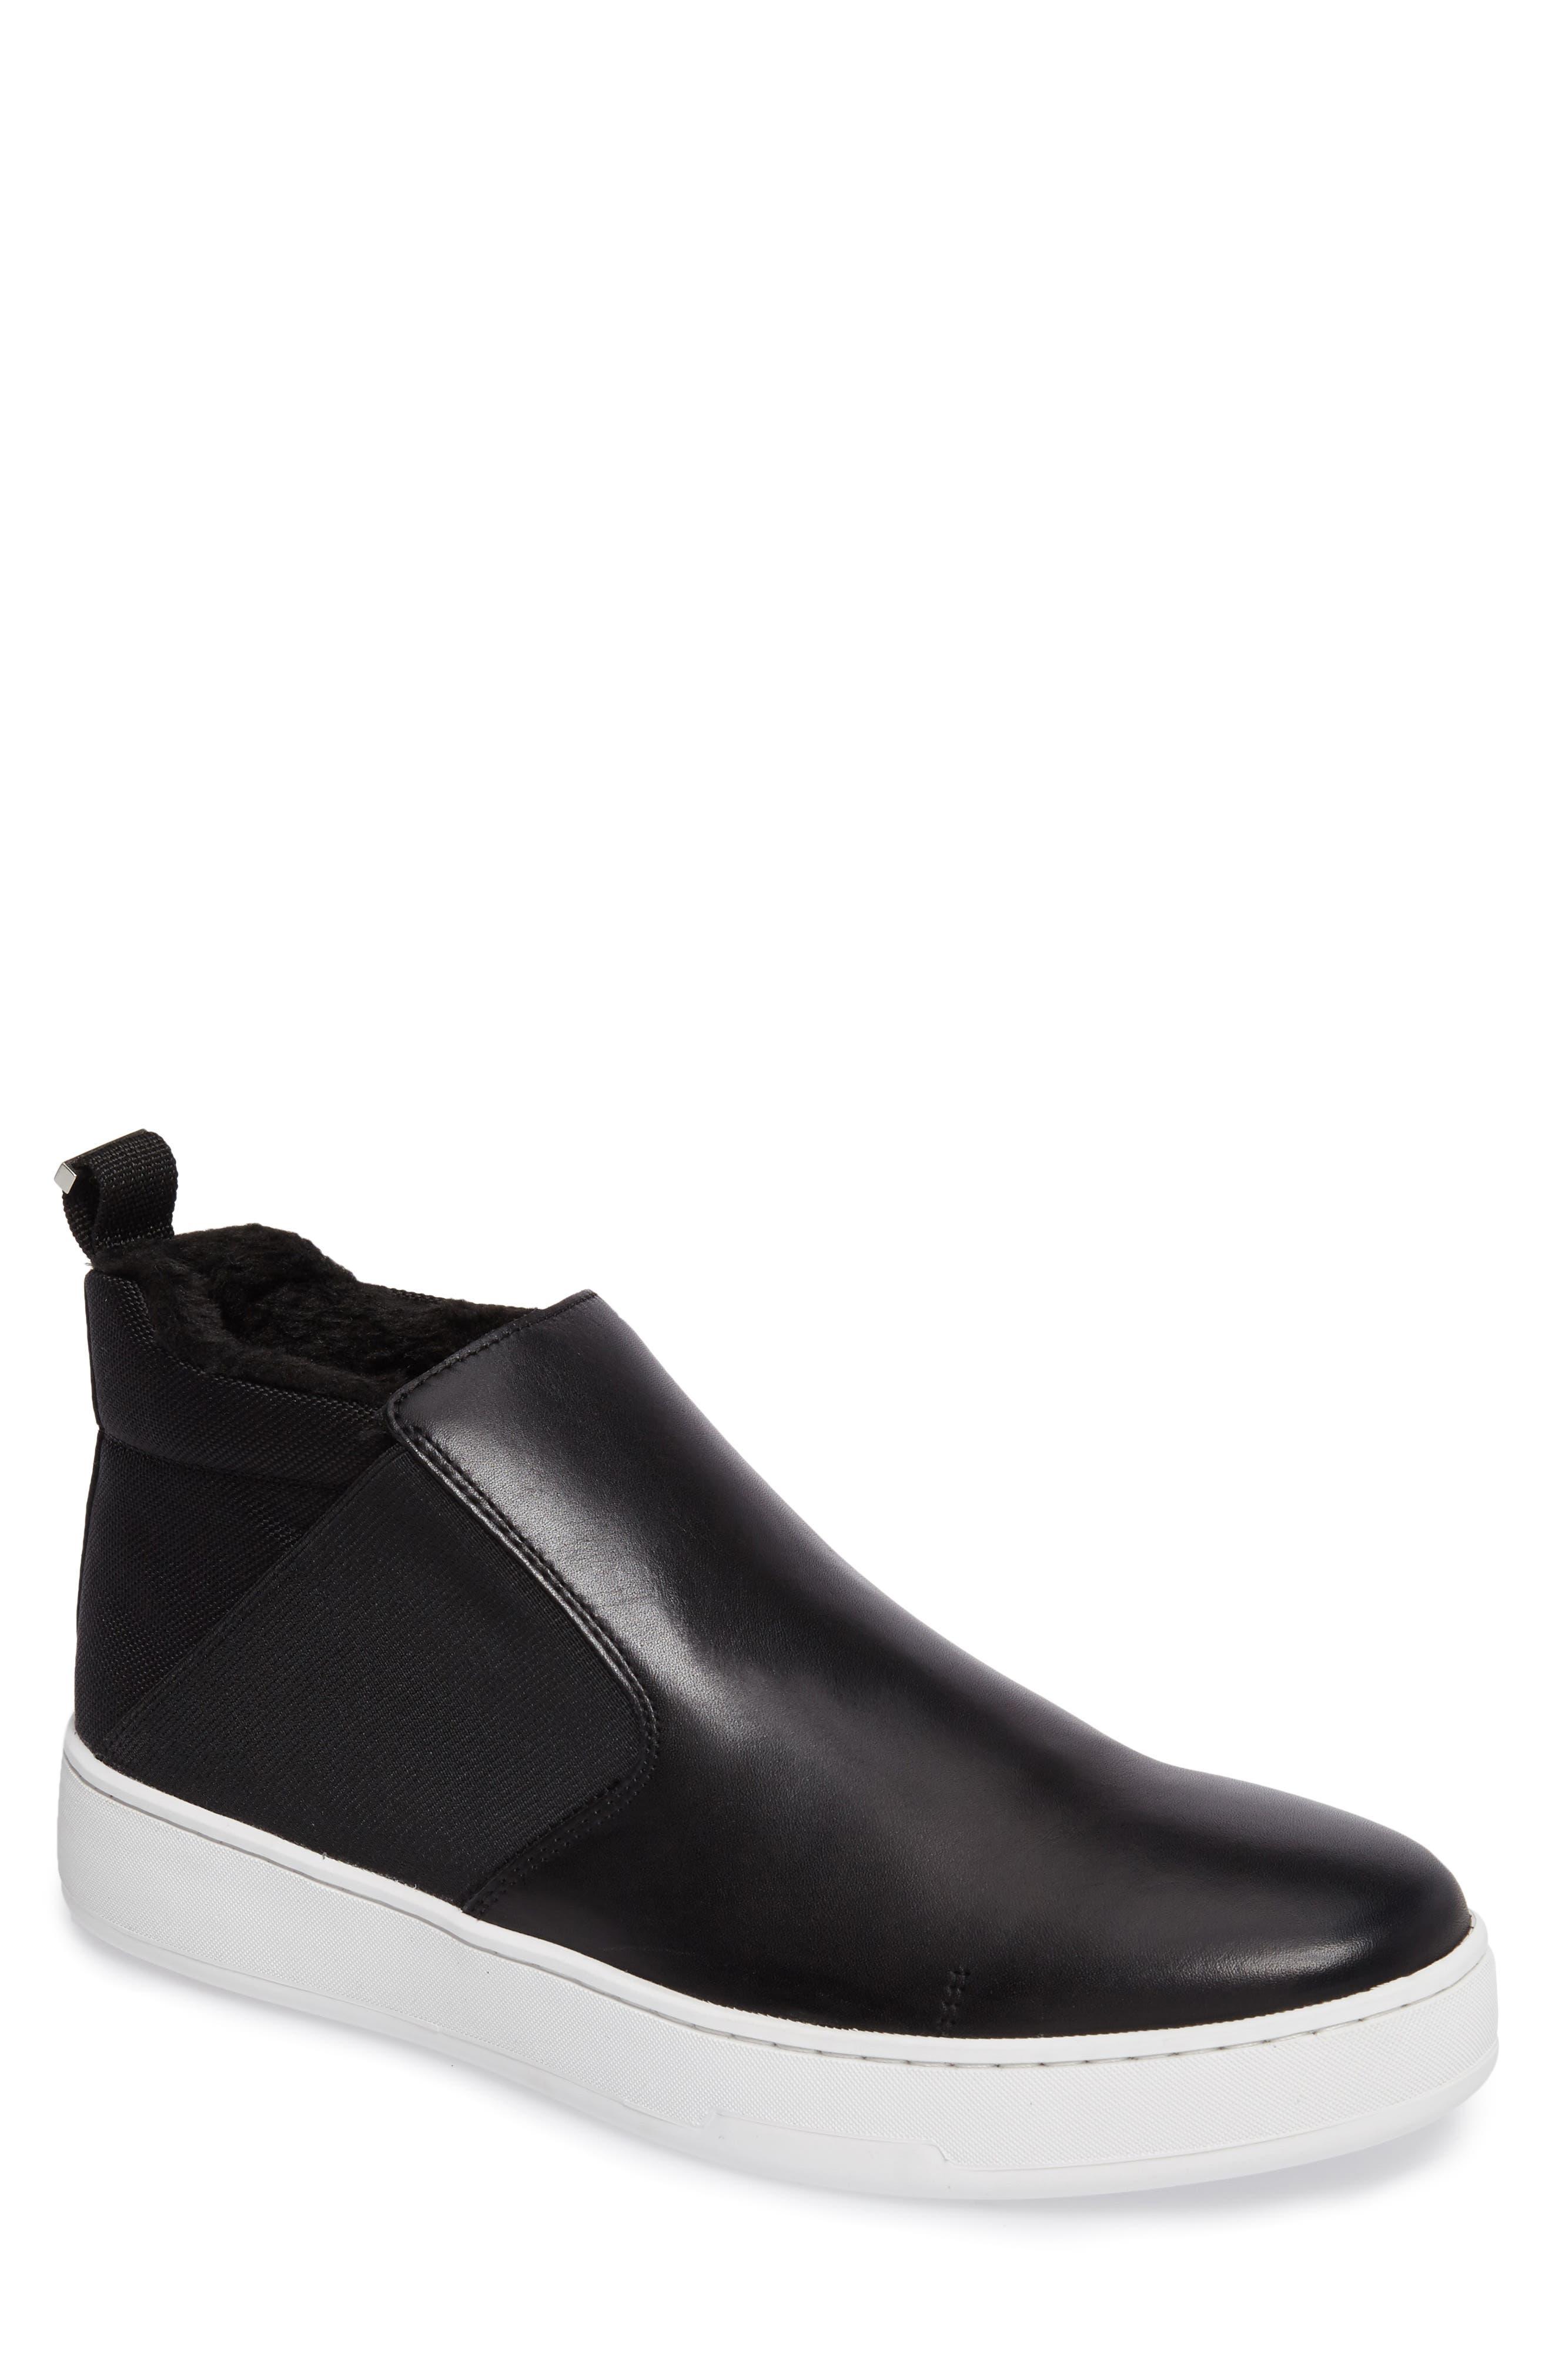 Noble Slip-On,                             Main thumbnail 1, color,                             Black Leather